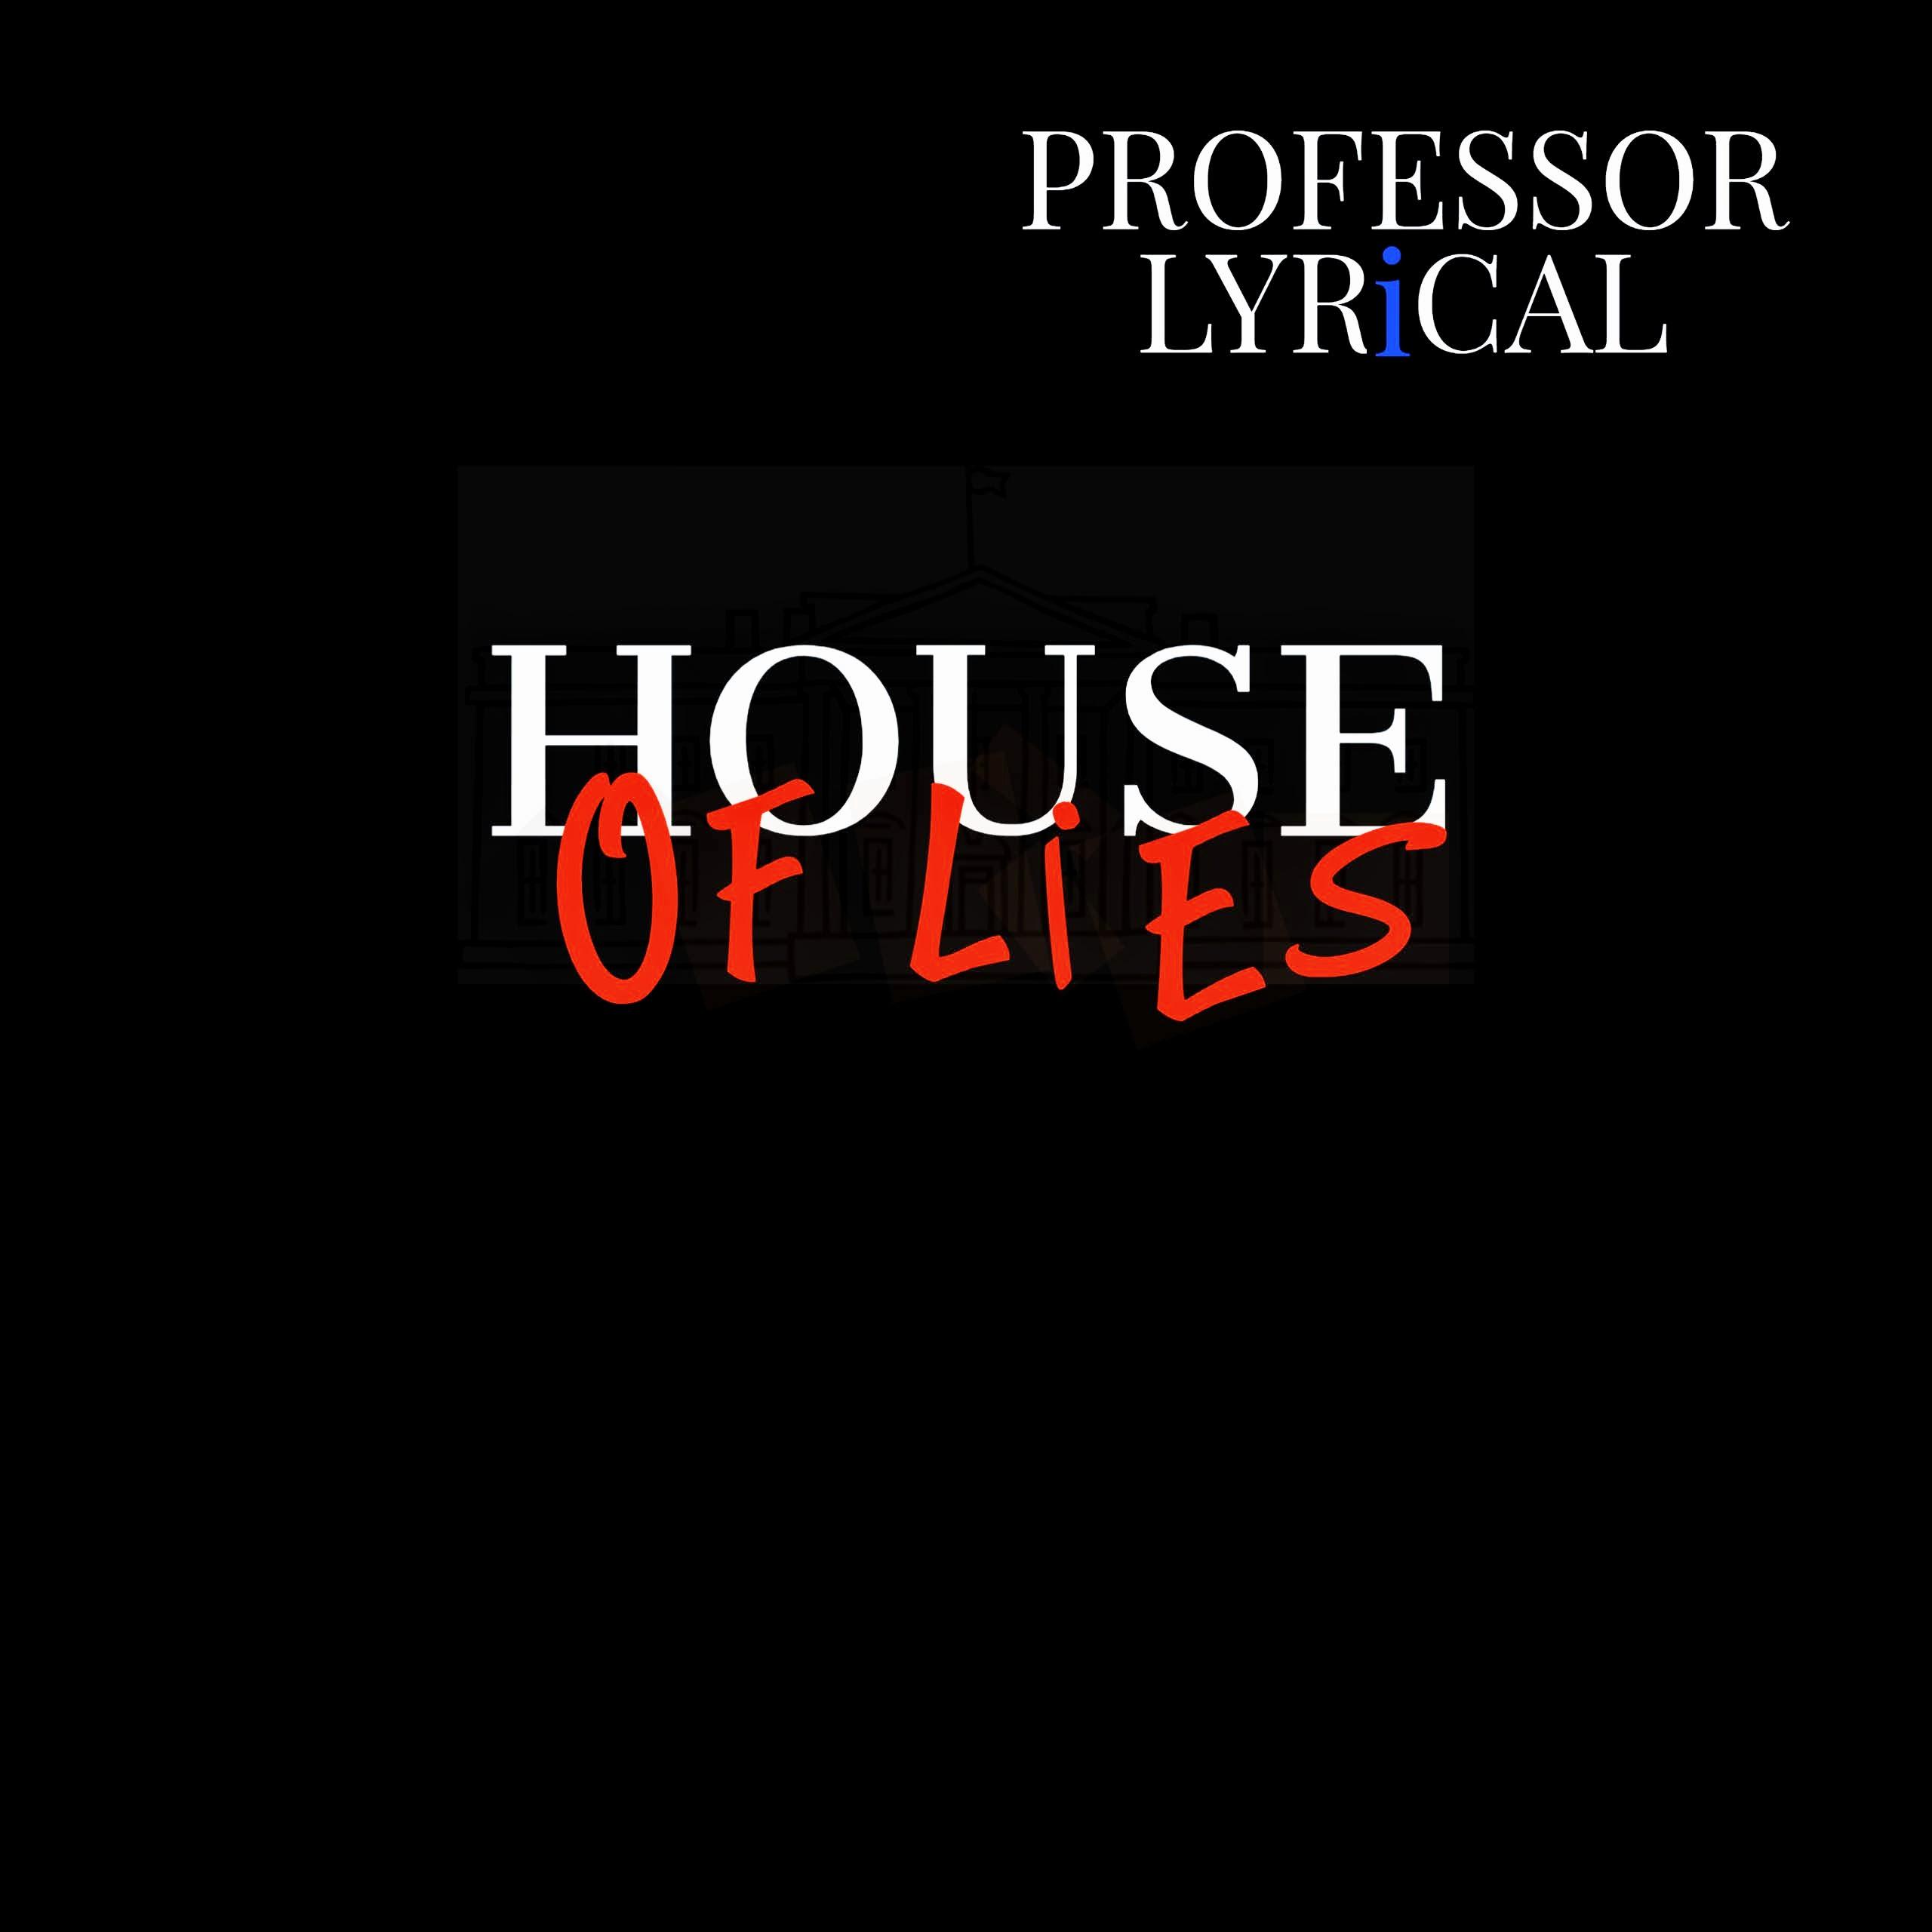 Legendary emcee, Professor Lyrical, releases House of Lies - groundbreaking video with massive twist surprise ending